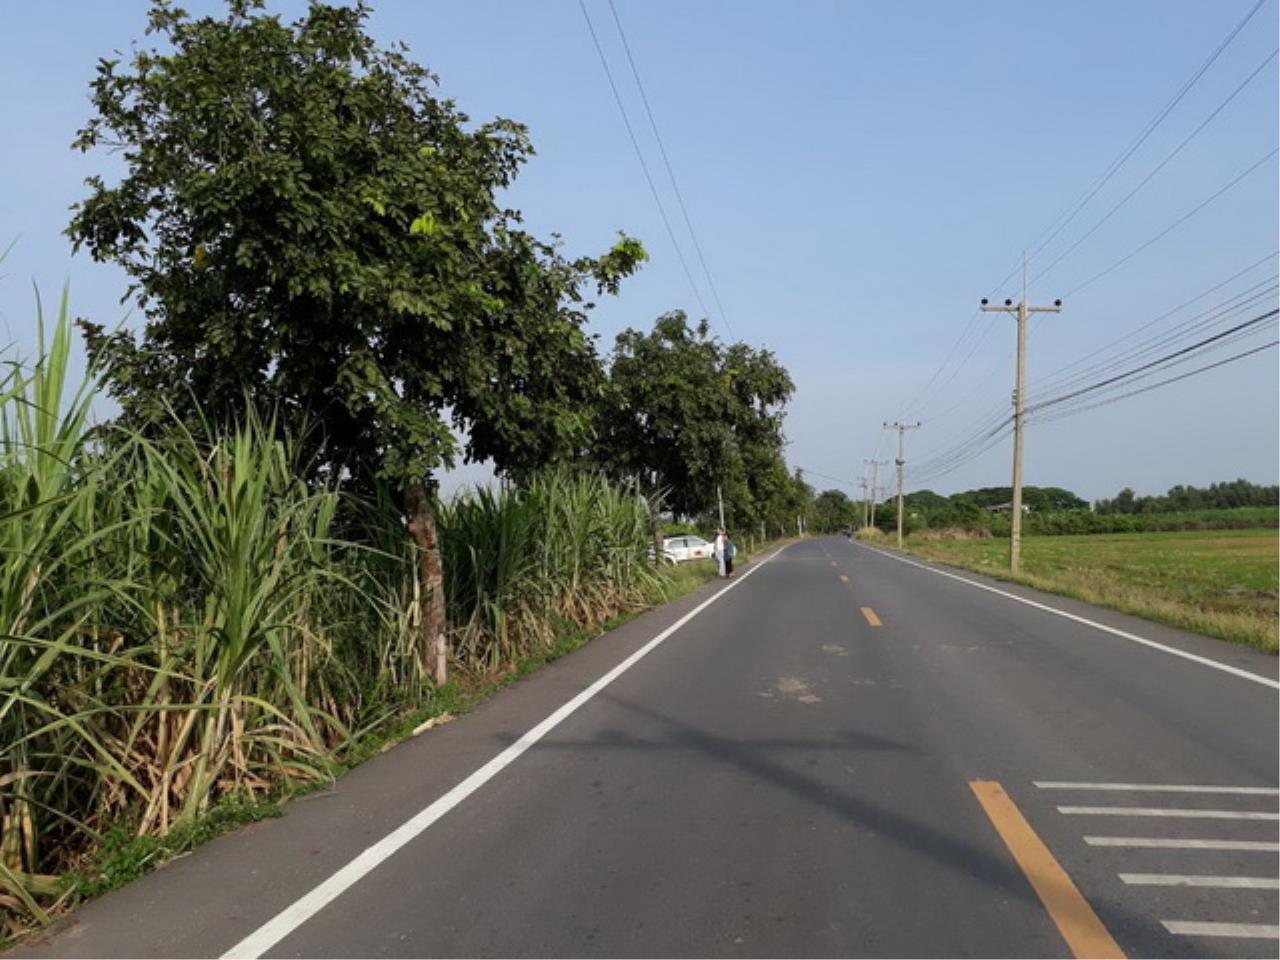 38648-Land for sale, in Patumthani, 40 rai